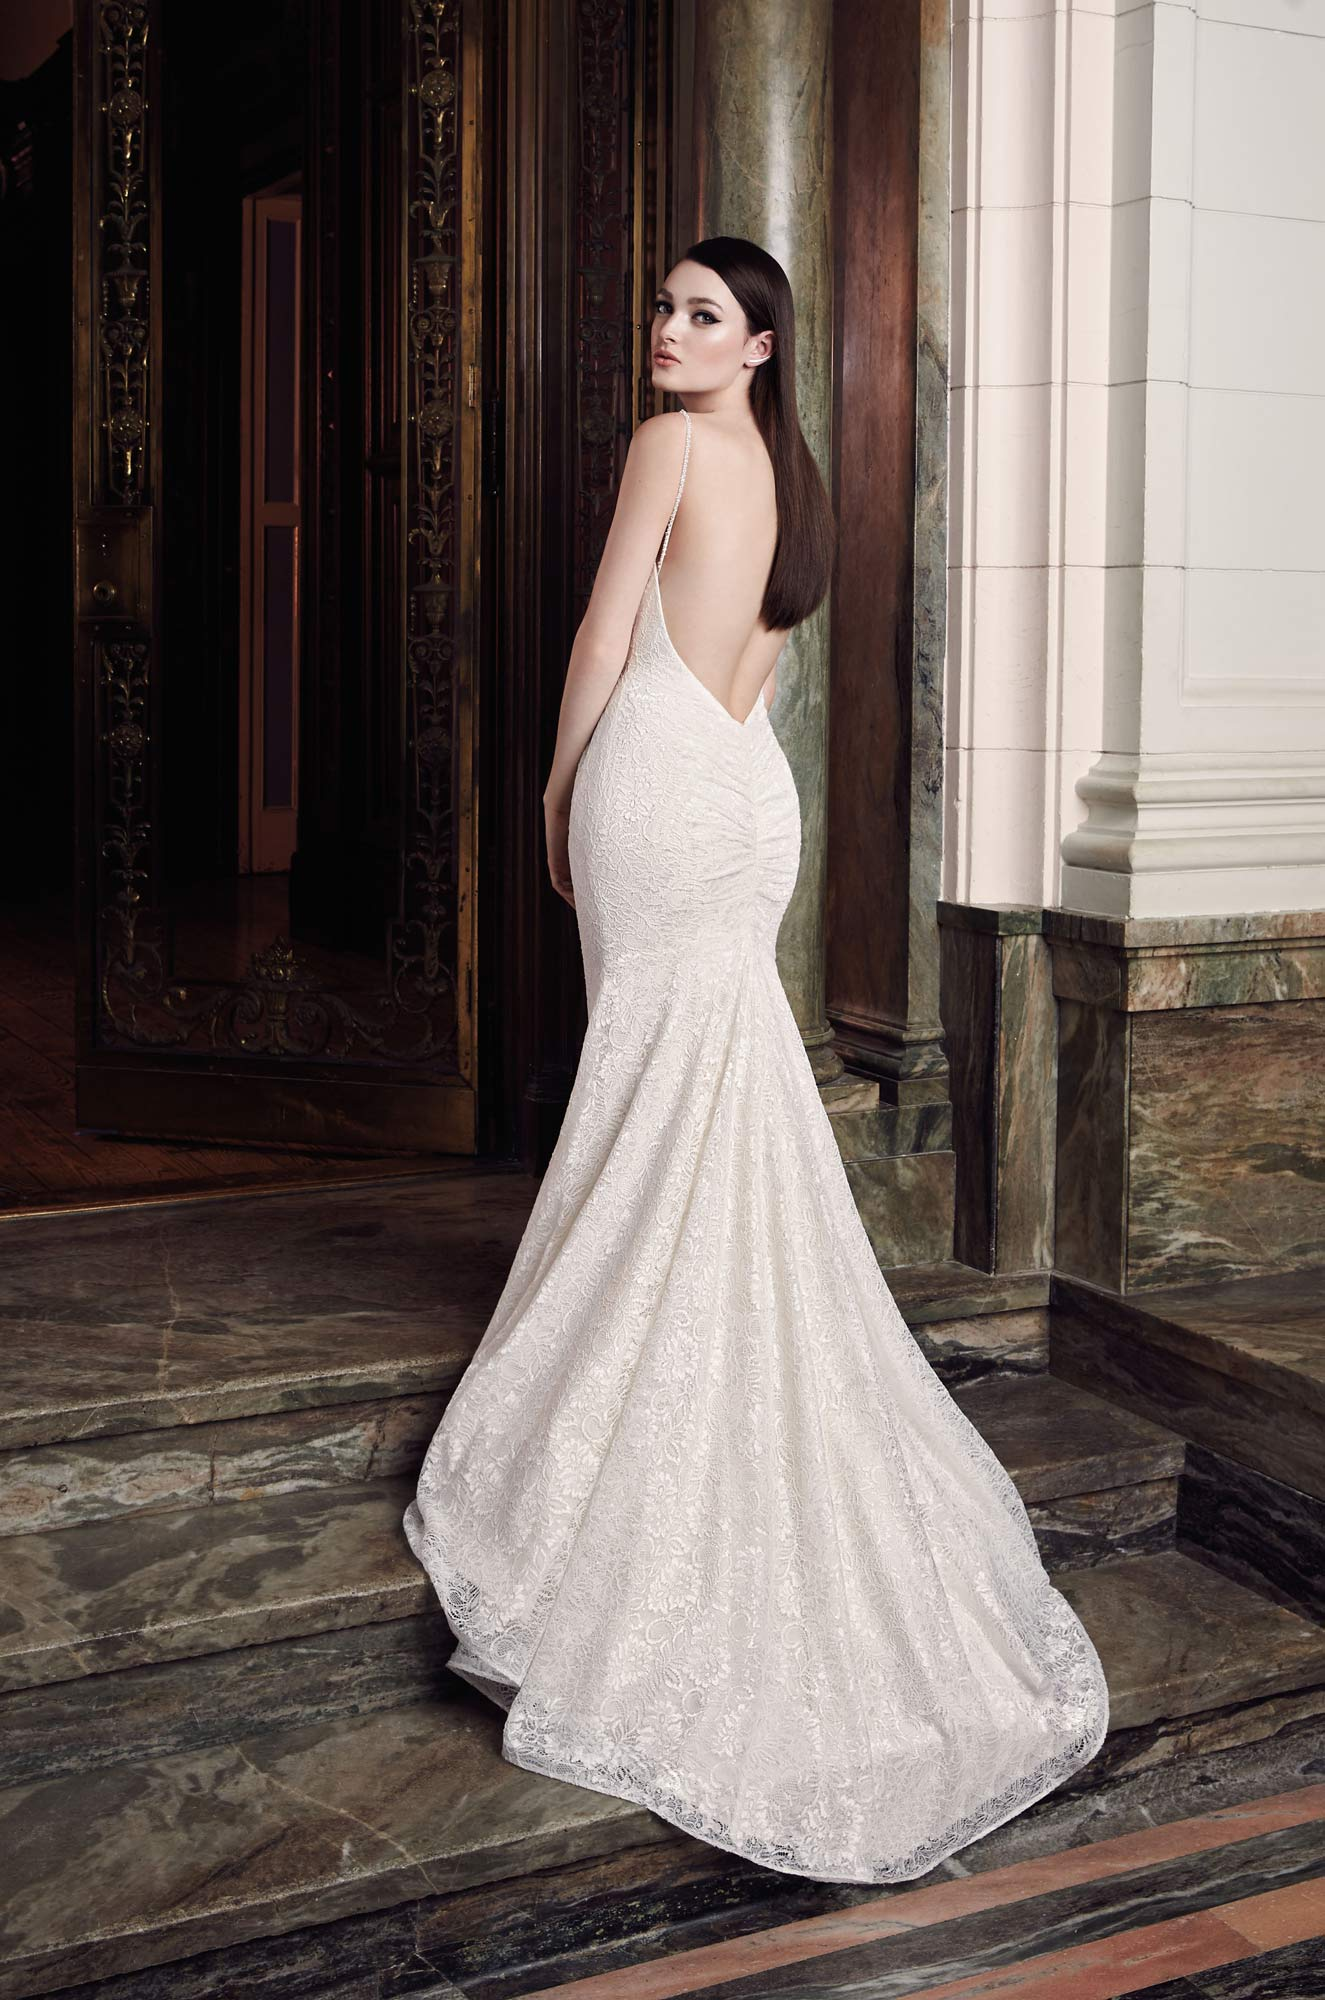 Beaded Strap Wedding Dress -Style #2012 | Mikaella Bridal